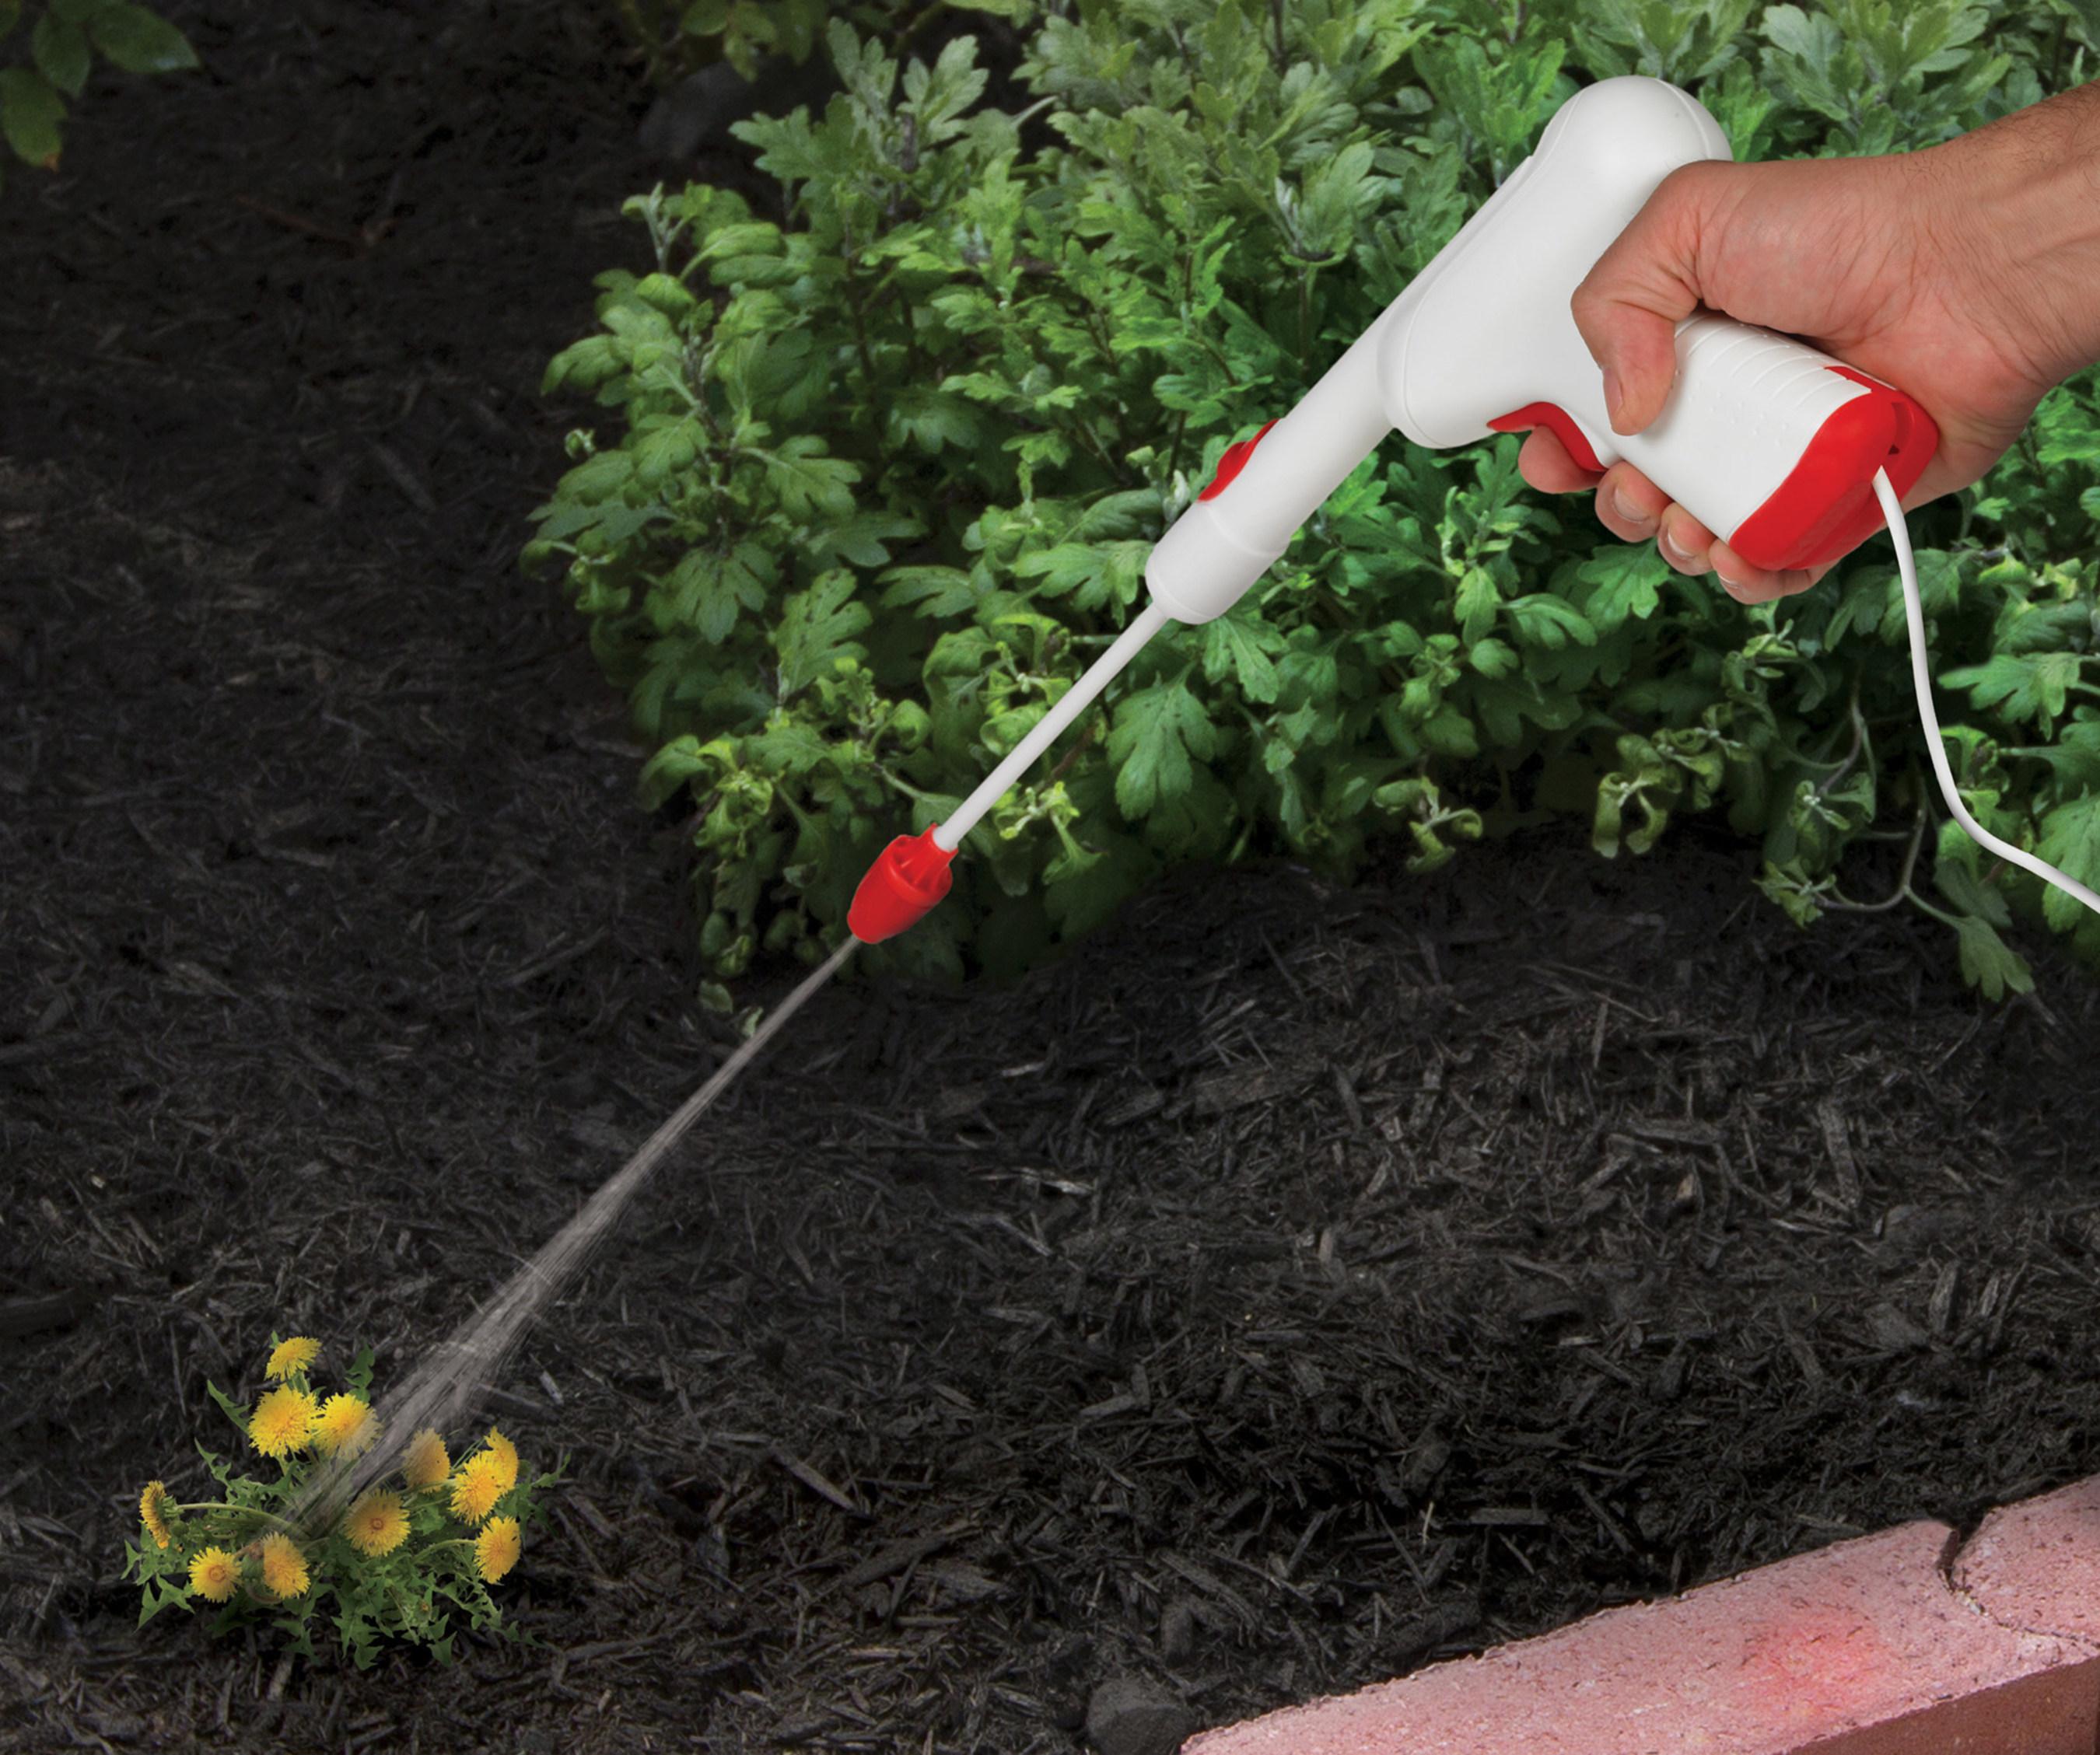 Spectracide AccuShot sprayer in action.